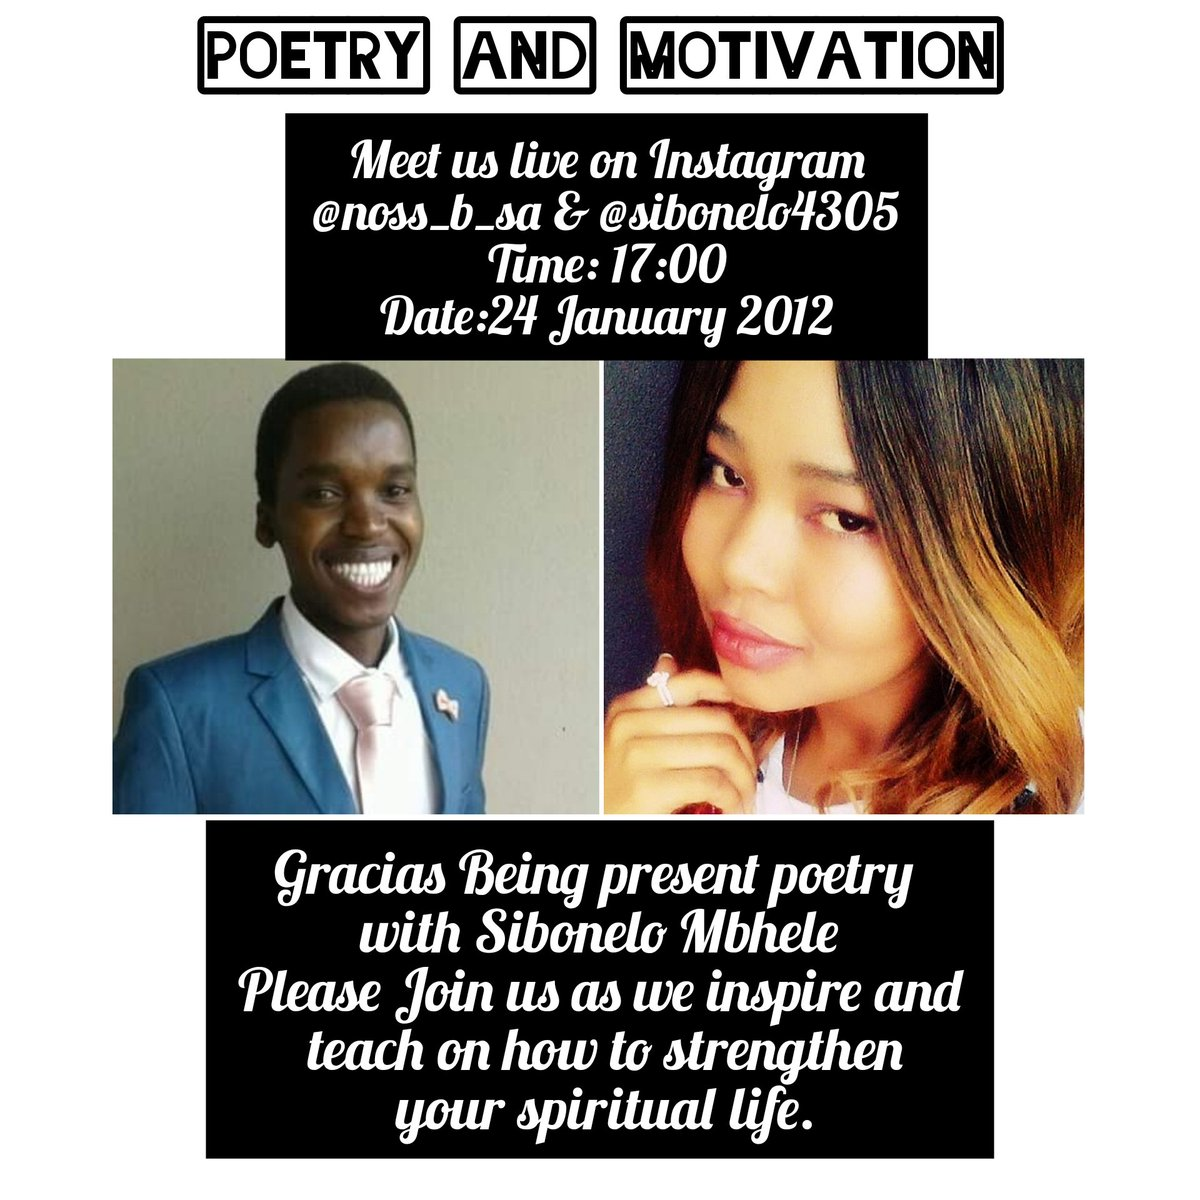 #sundayvibes #poetrylovers #MotivationalQuotes